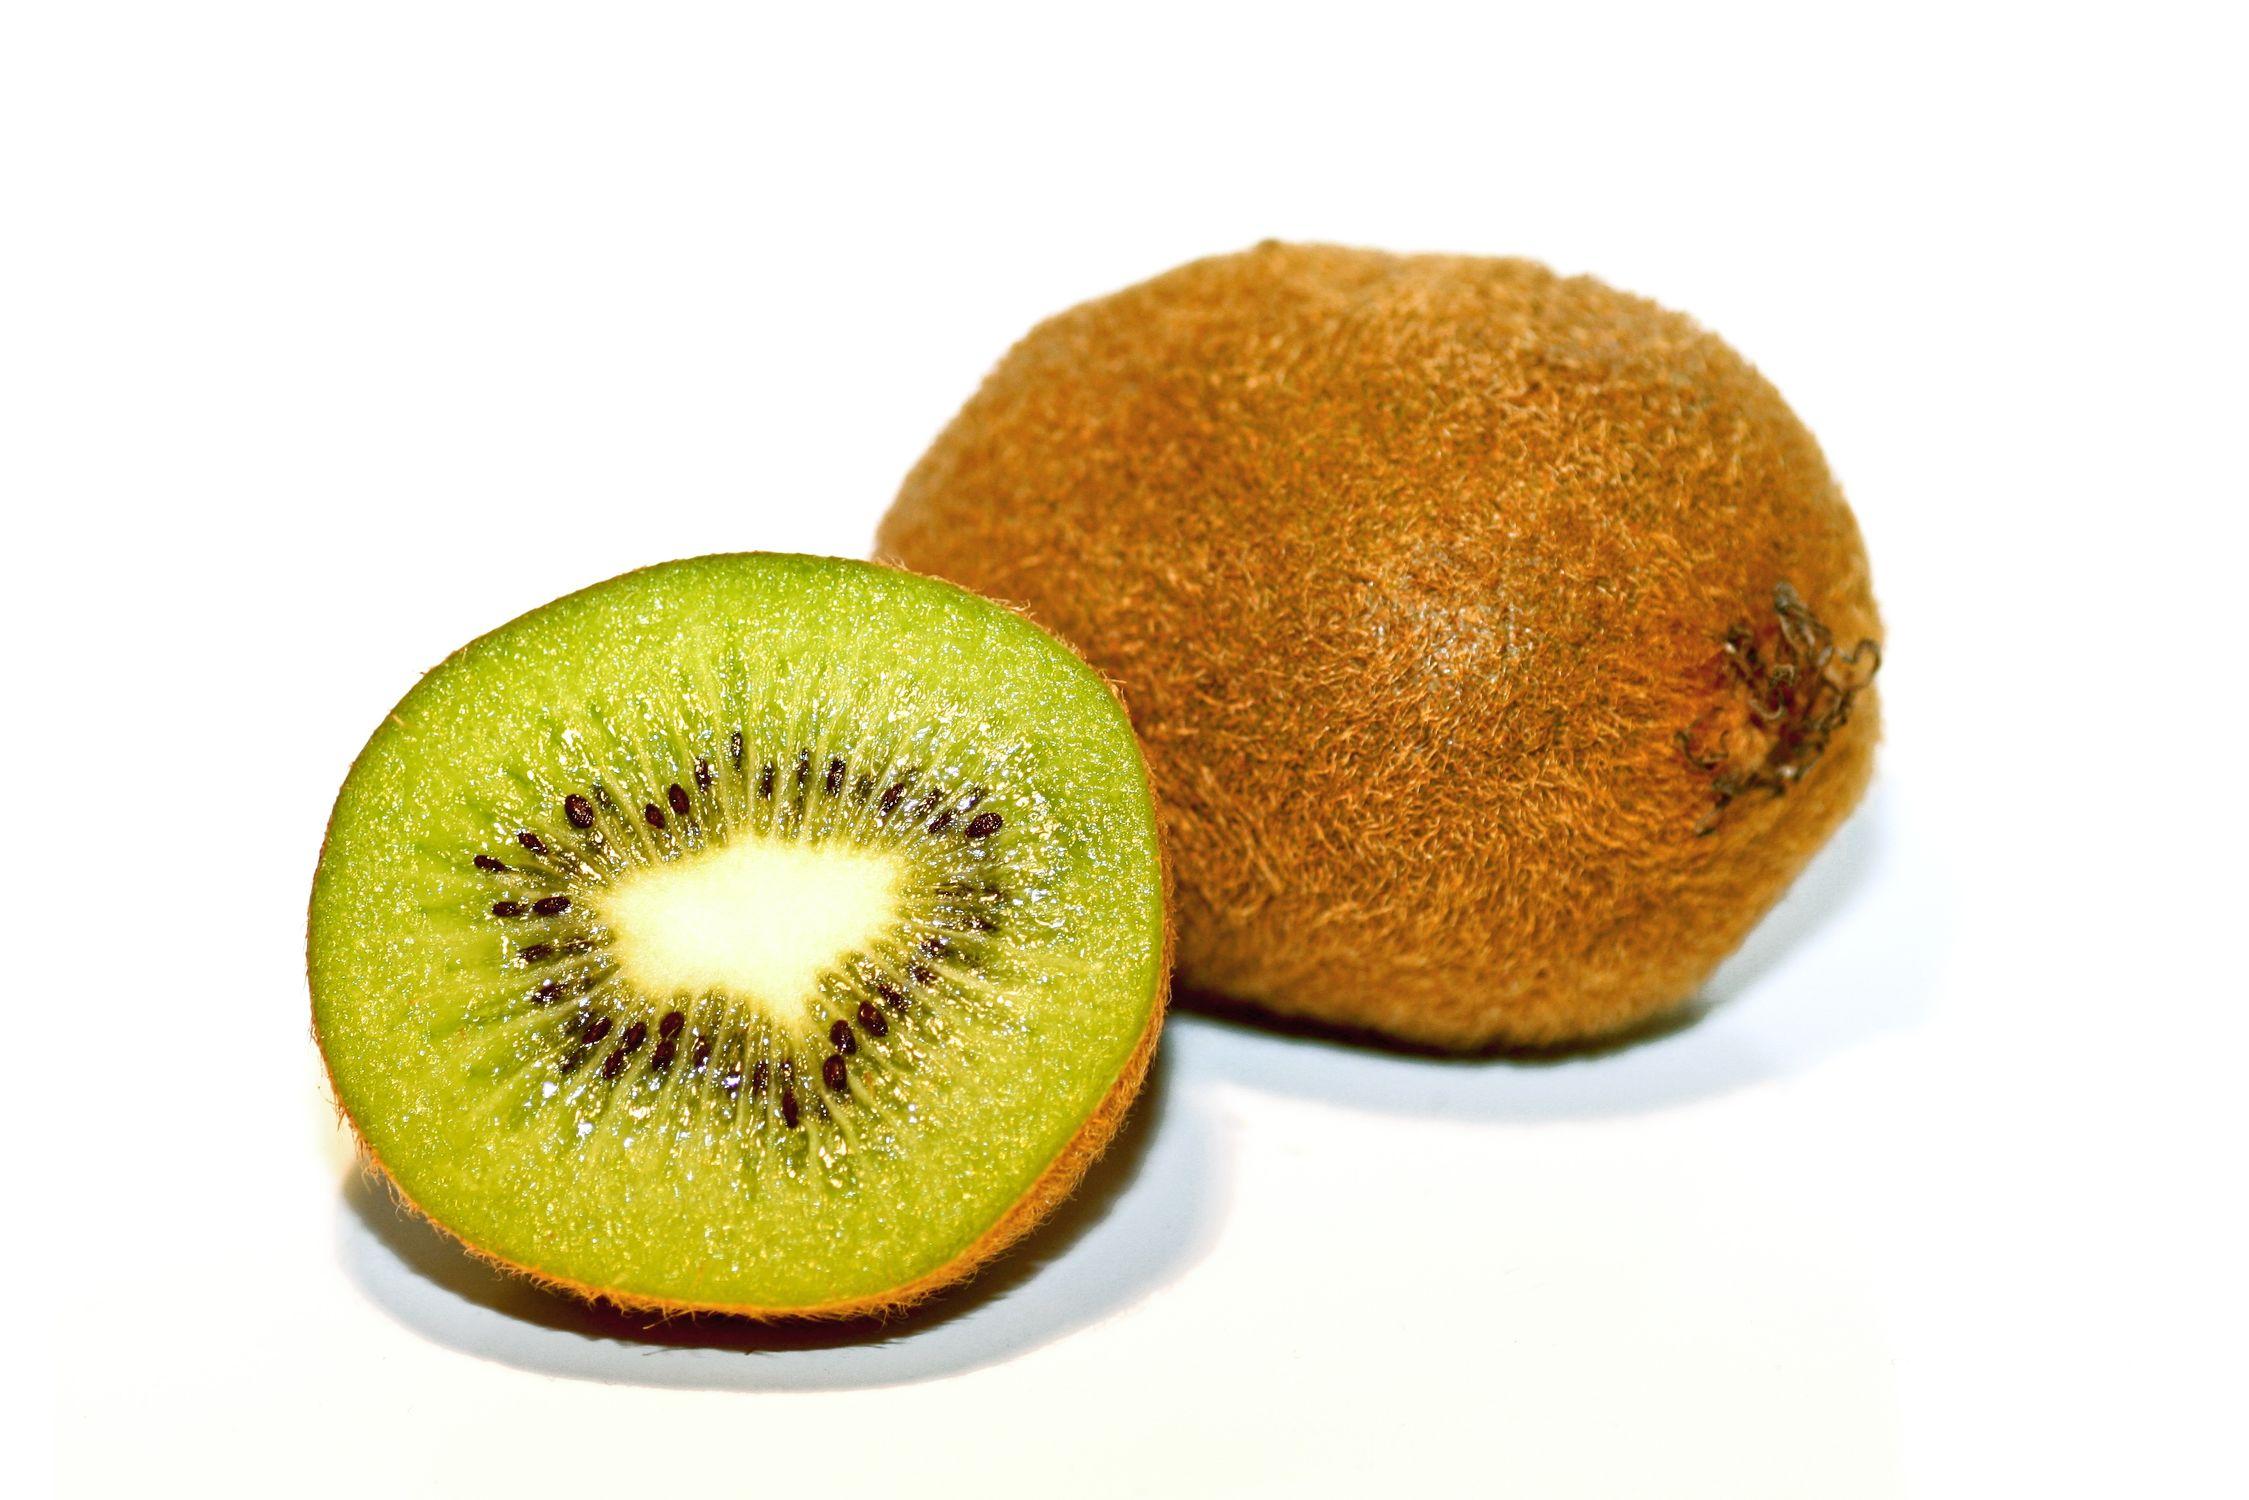 Bild mit Früchte, Lebensmittel, Essen, Frucht, Fruit, Fruits, Kiwi, Kiwies, Kiwifrucht, Küchenbild